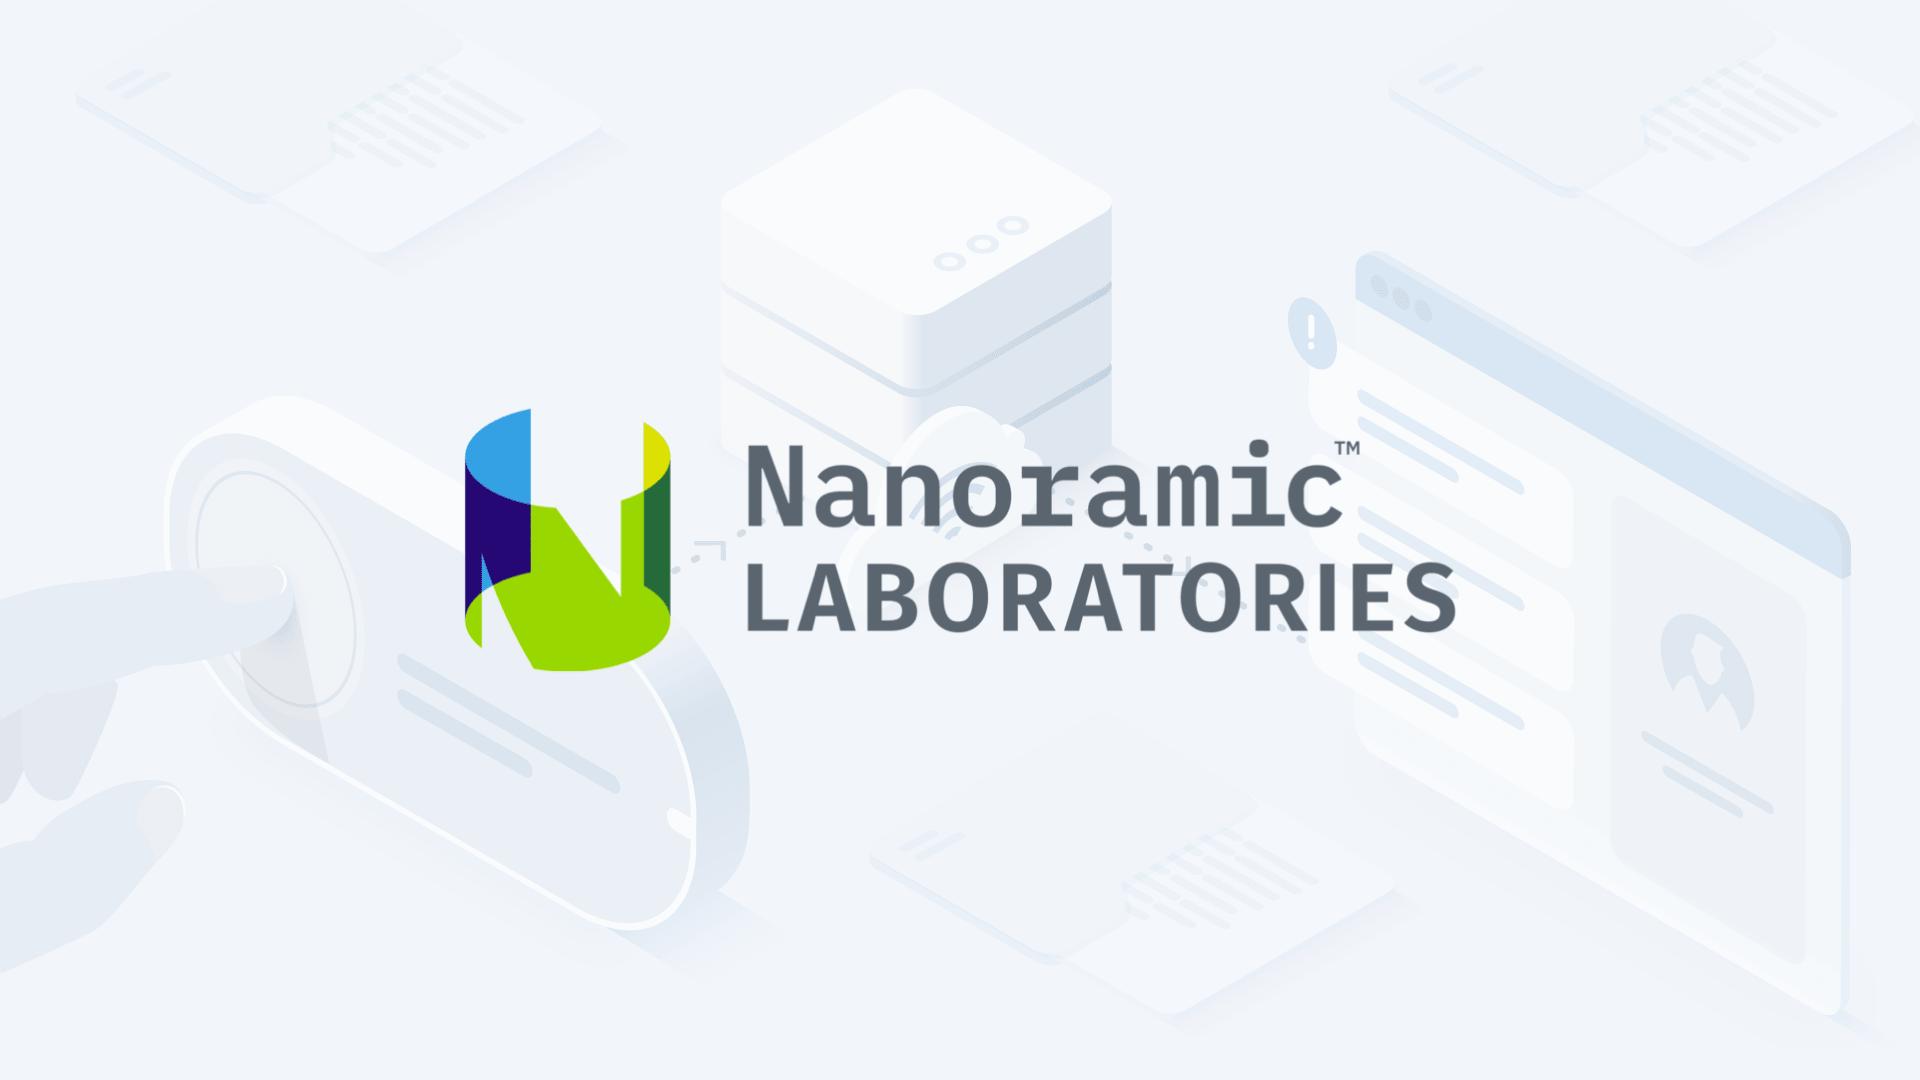 How AgileVision.io helped Nanoramic Laboratories reduce organizational friction